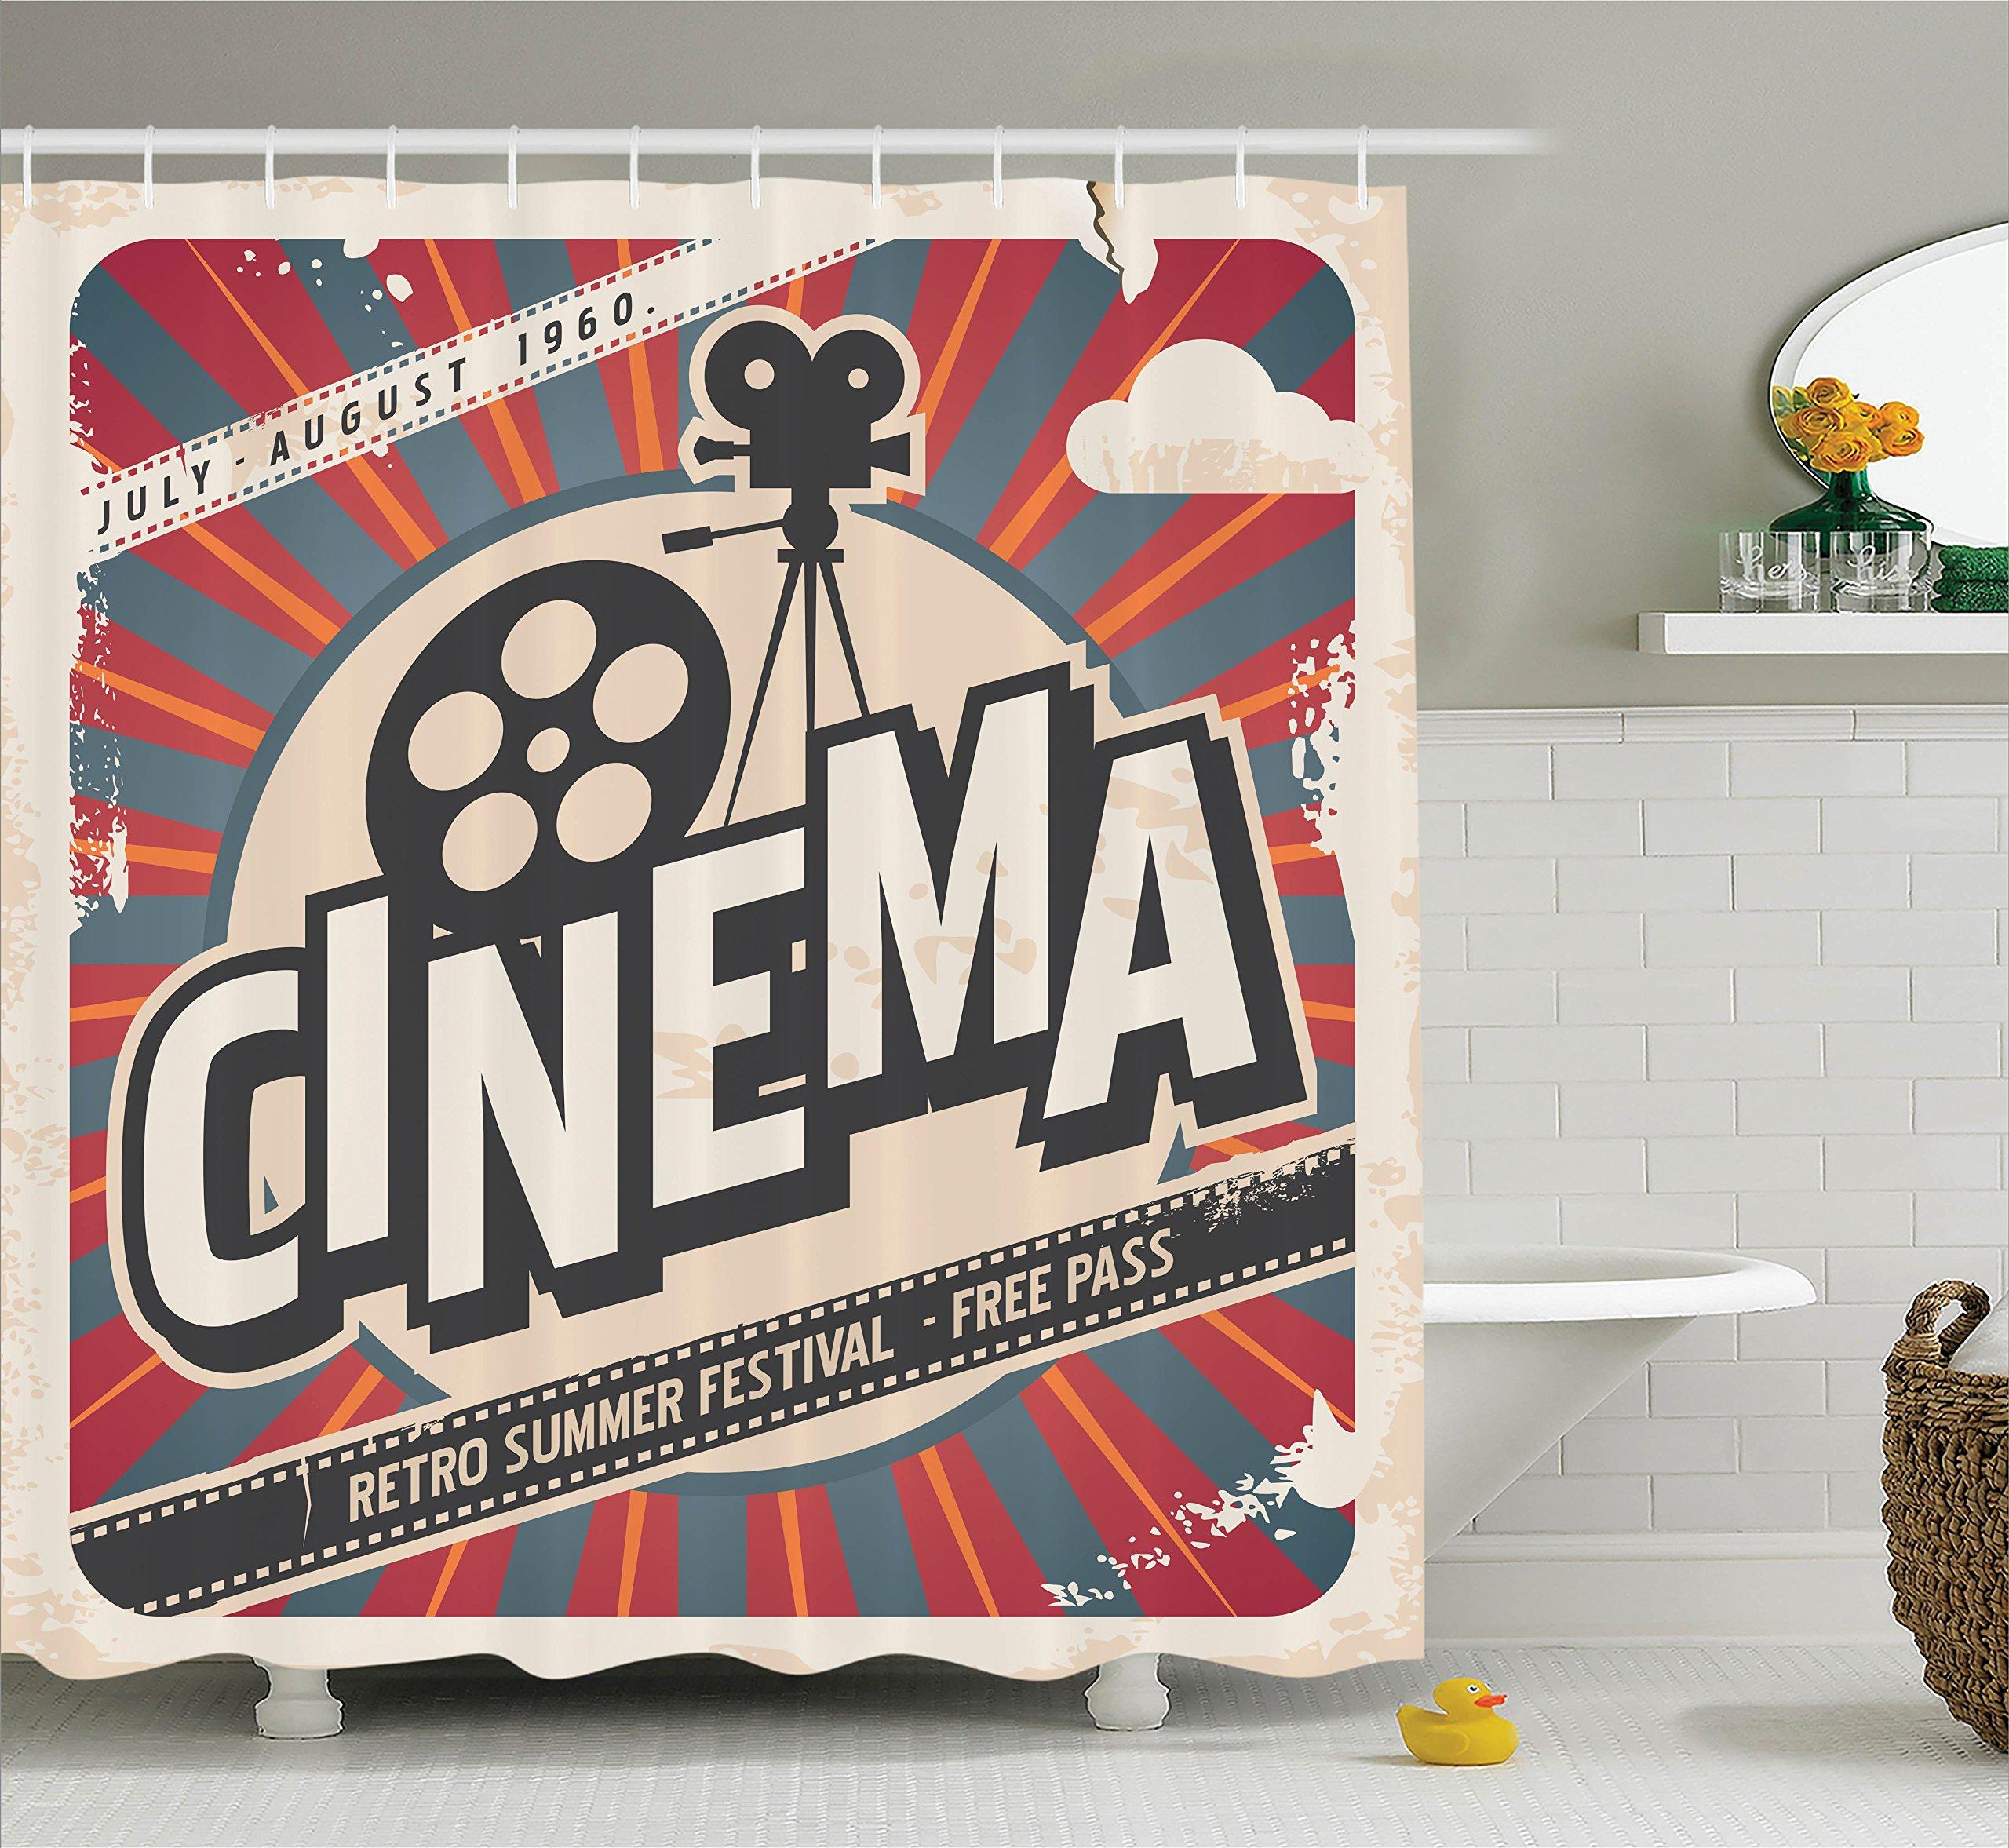 Ambesonne Vintage Decor Shower Curtain Set, Retro Cinema Movie Vintage Paper Texture Hollywood Stars Decorative Design, Bathroom Accessories, 69W X 70L Inches, Beige Amber Charcoal Grey